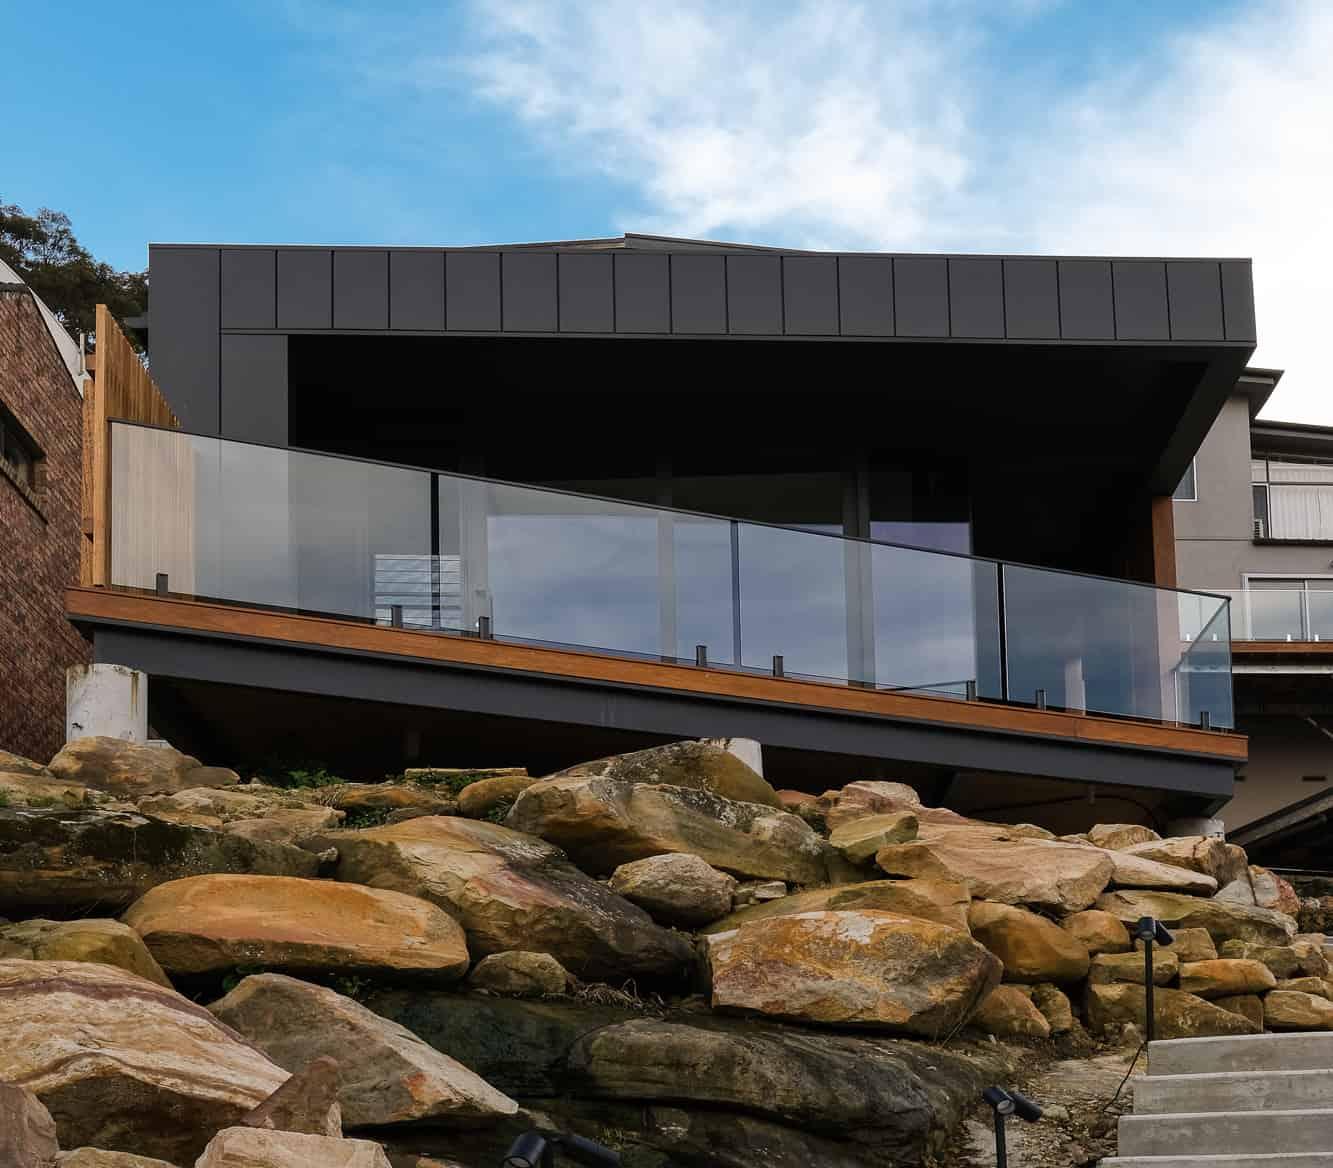 Street View of Seaforth Property Featuring Black Interlocking Panels